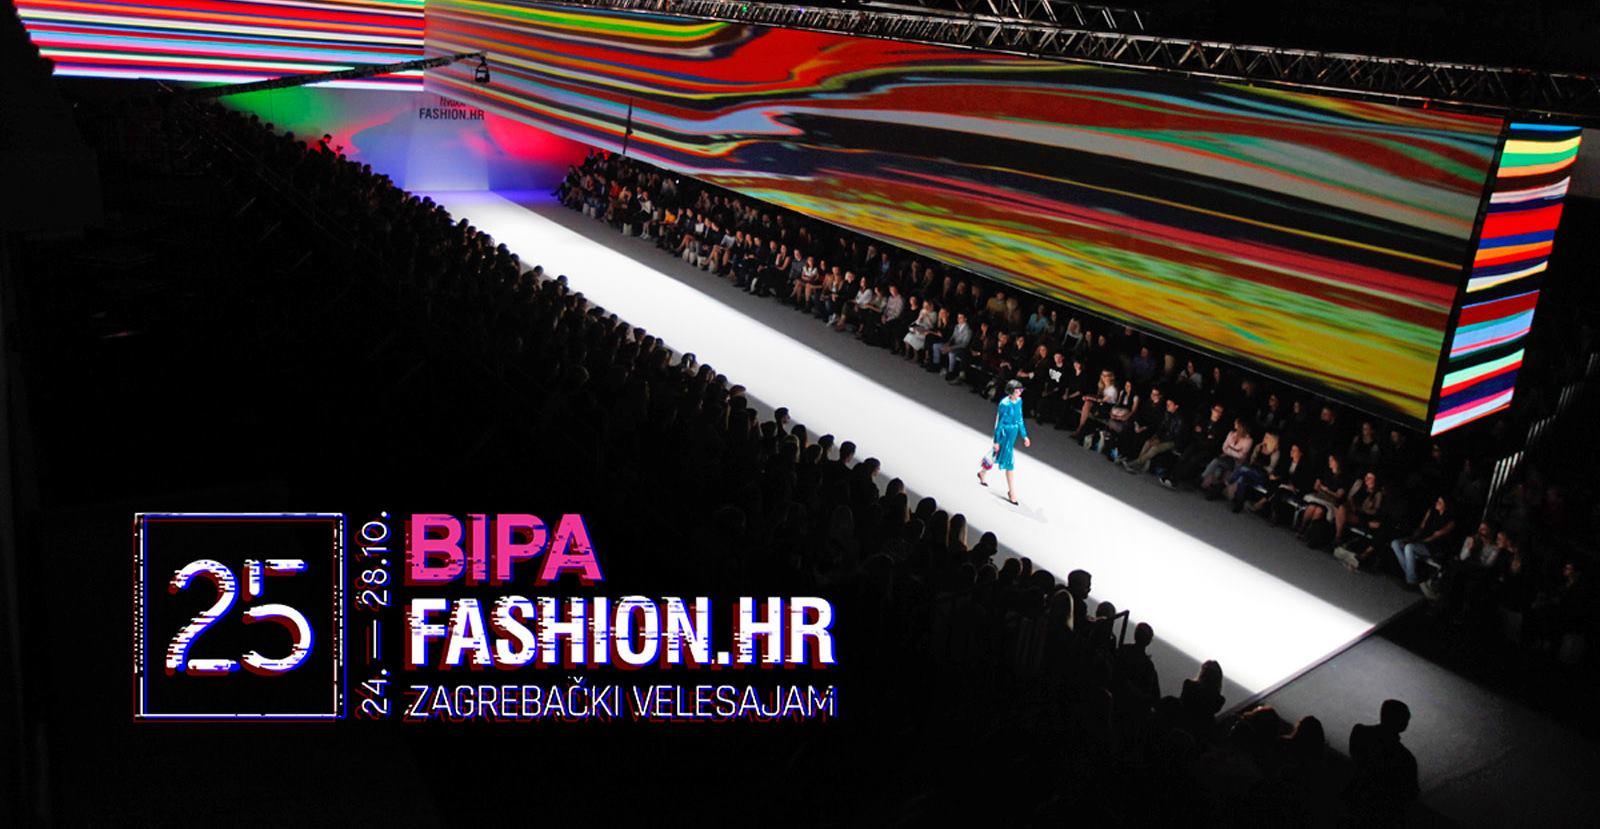 FOTO: Uspješnih dvadesetipet sezona BIPA FASHION.HR-a